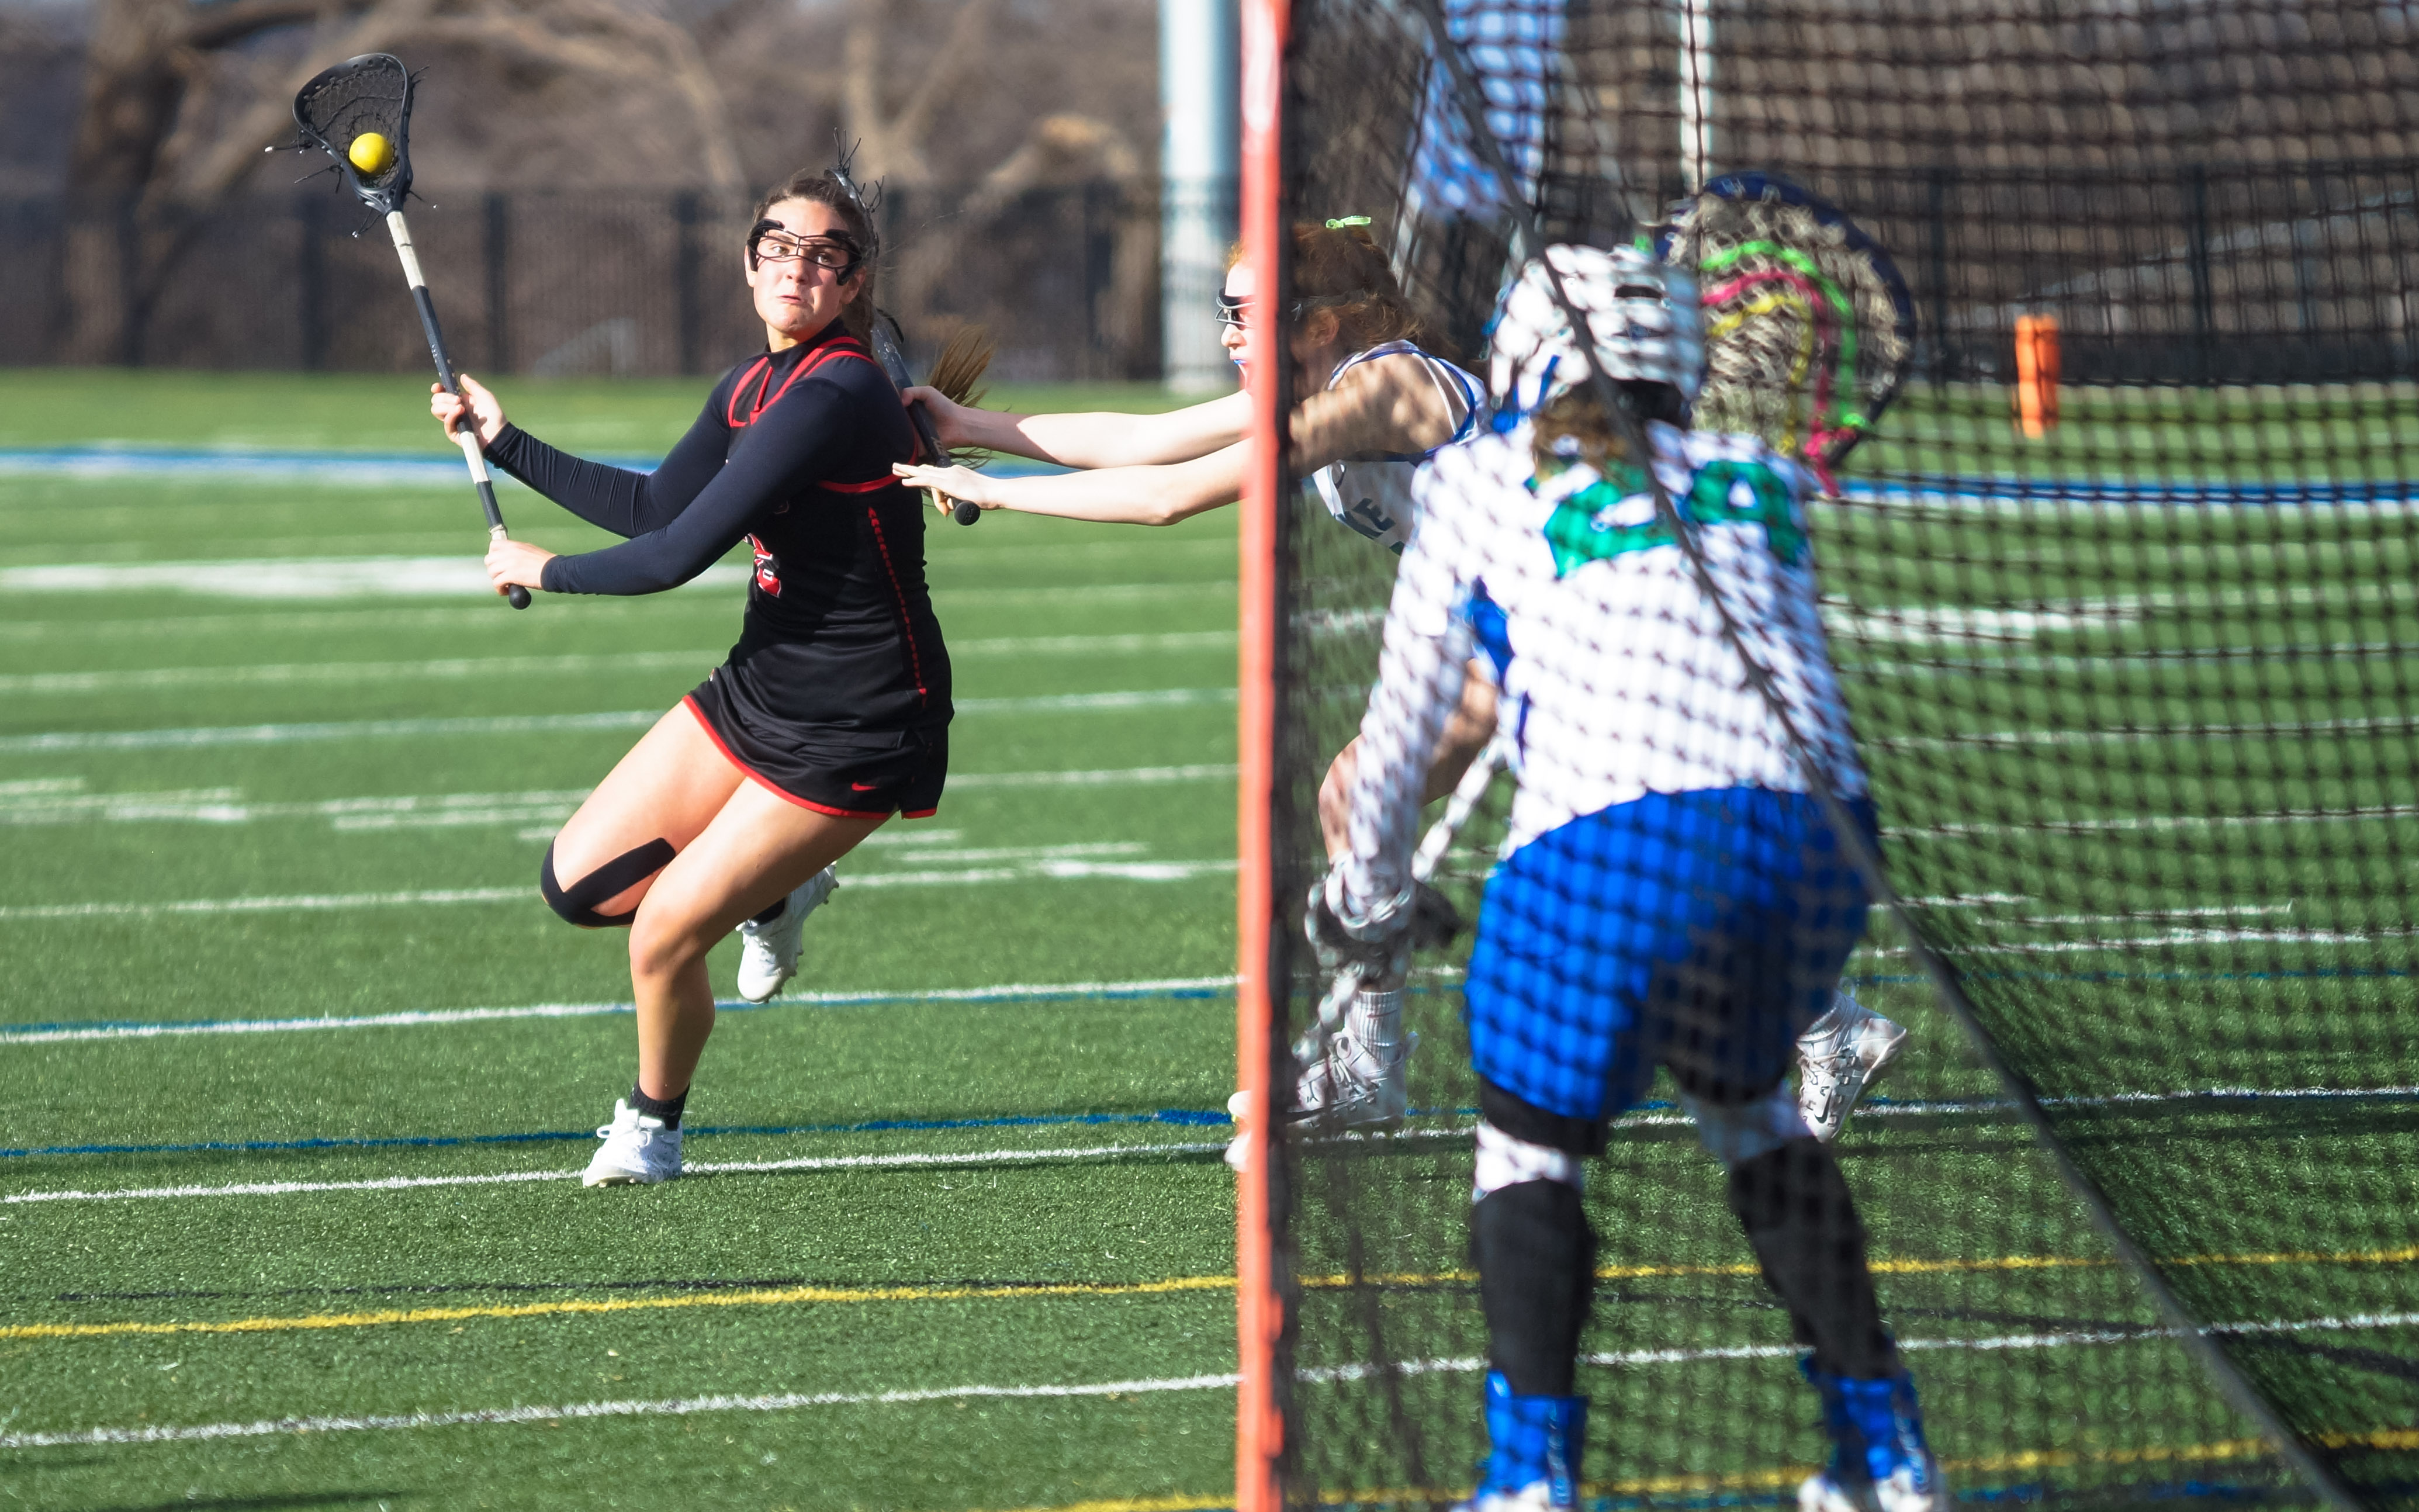 Minnehaha Academy senior Grace Nickoloff with a shot during play Thursday against Blake. Nickoloff had three goals in the match. Photo by Korey McDermott, SportsEngine